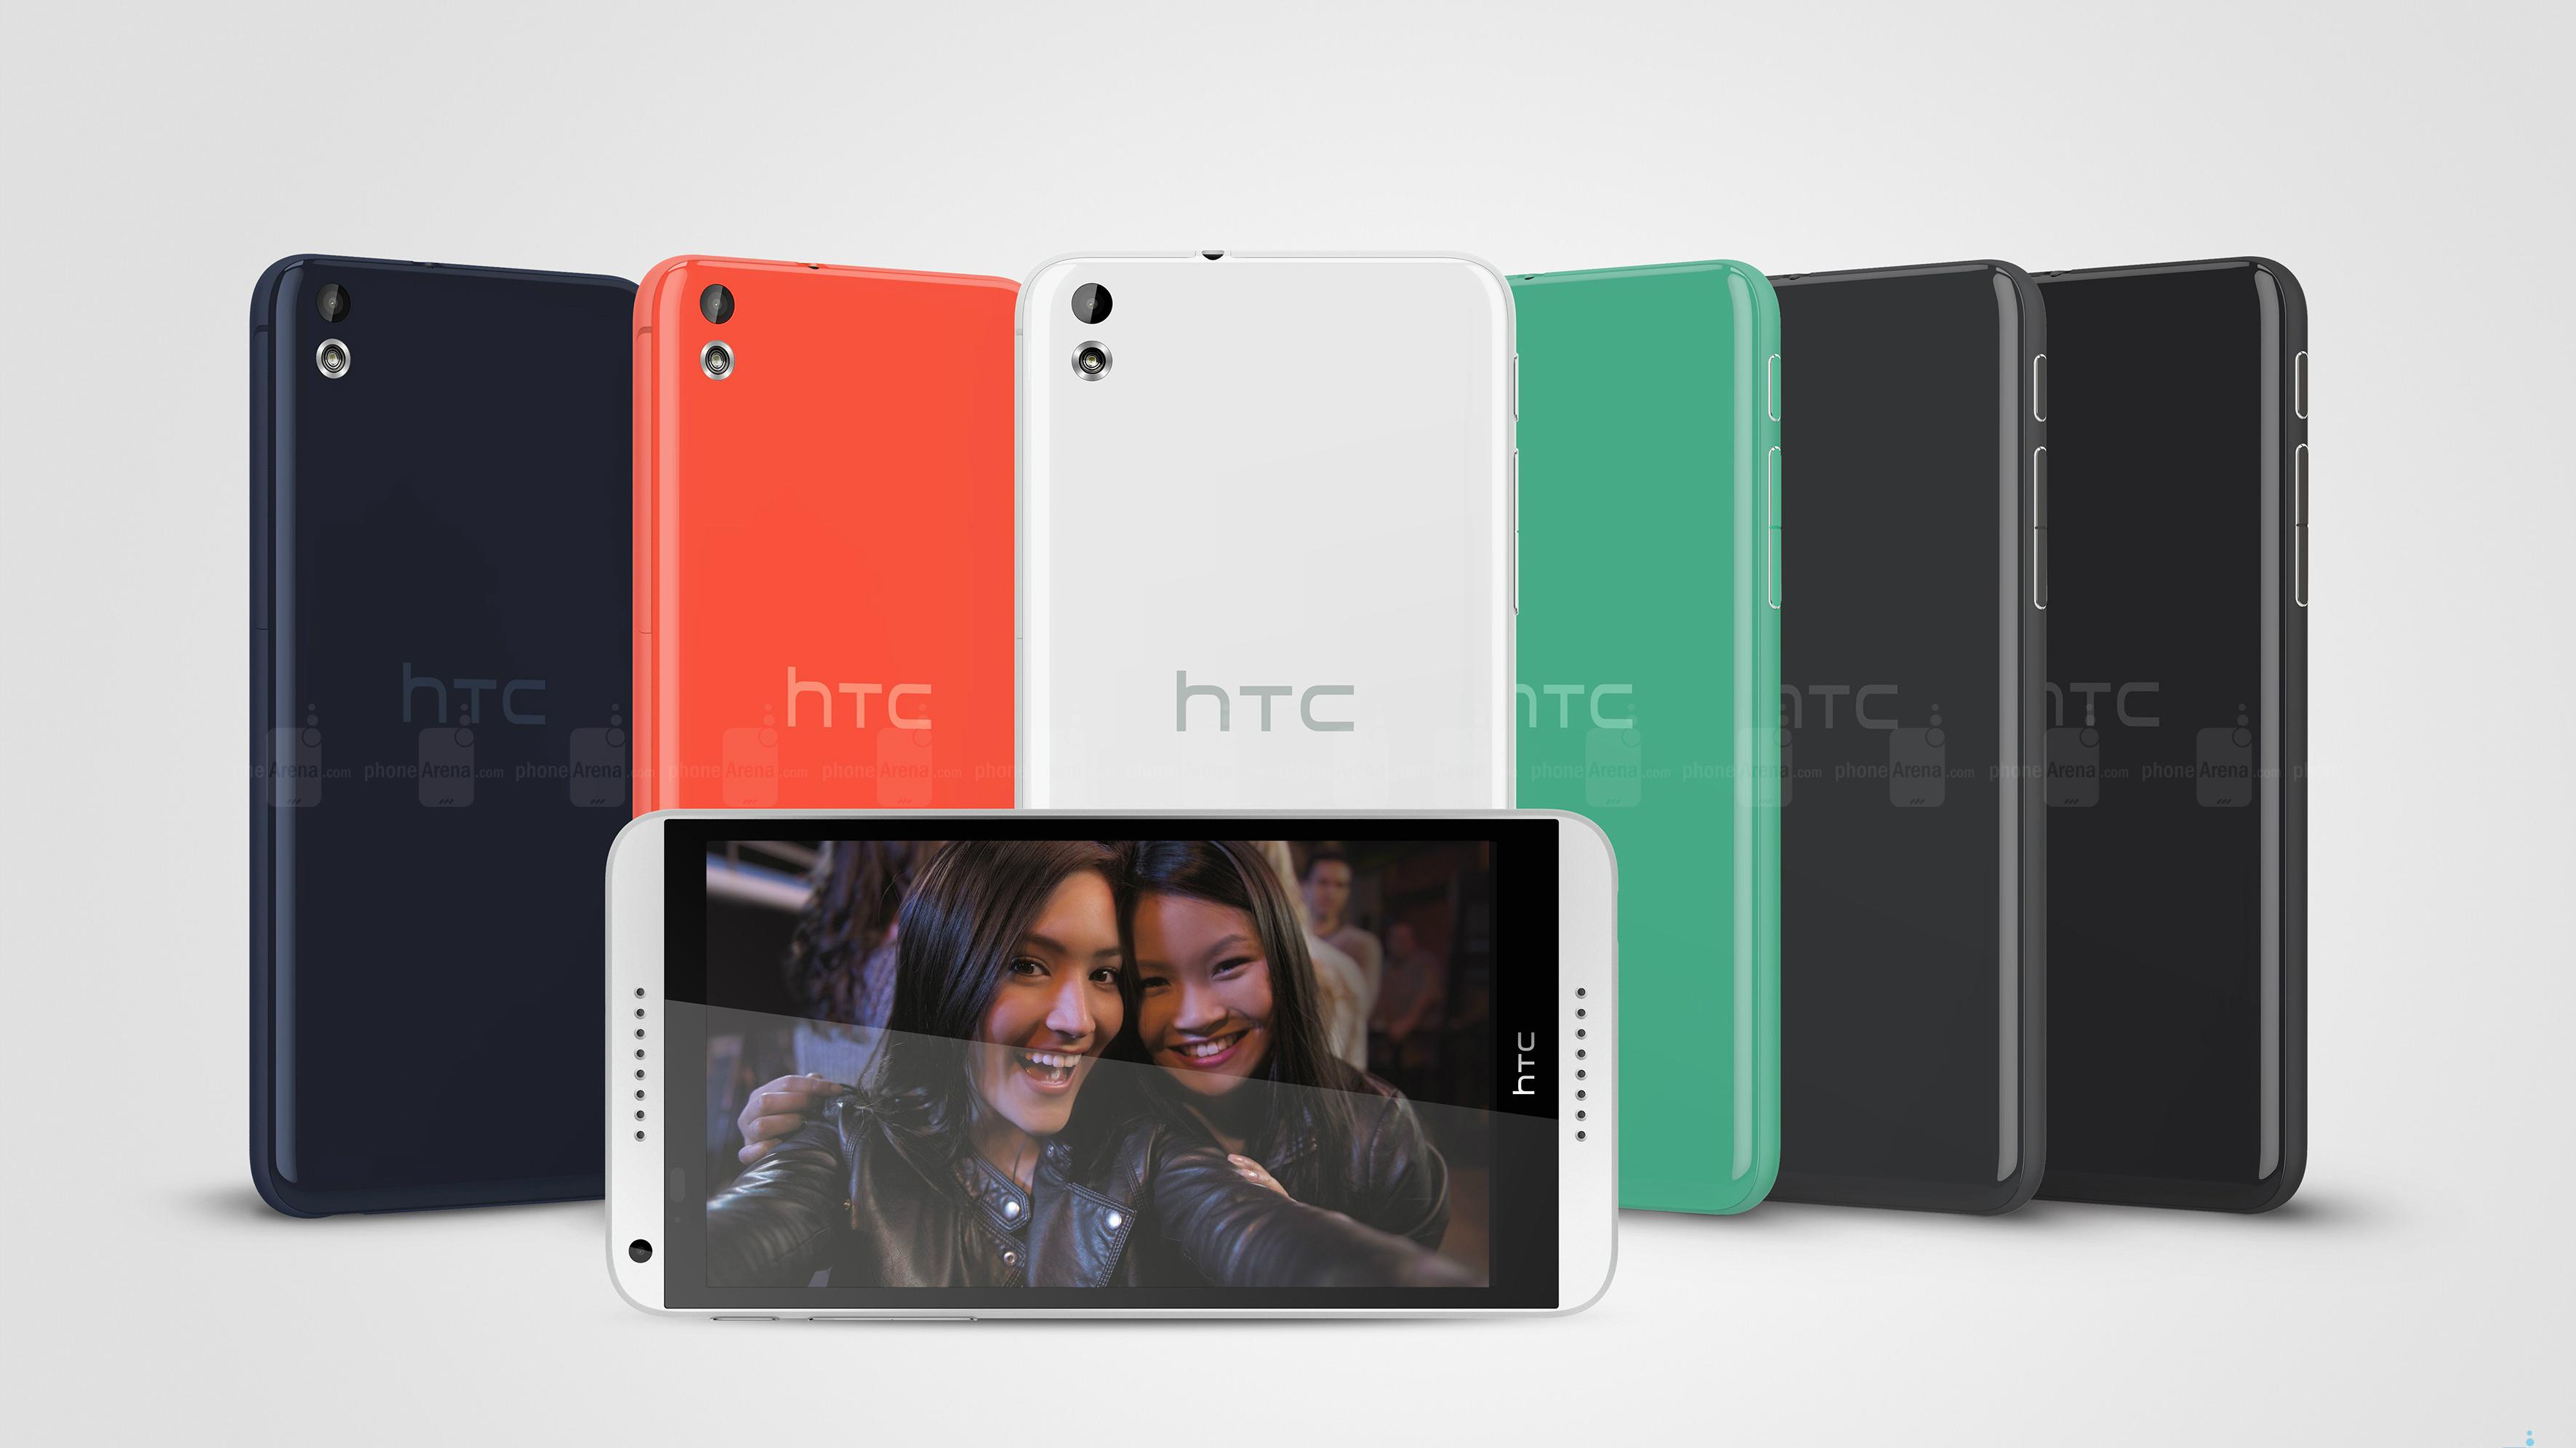 HTC-Desire-816-1a